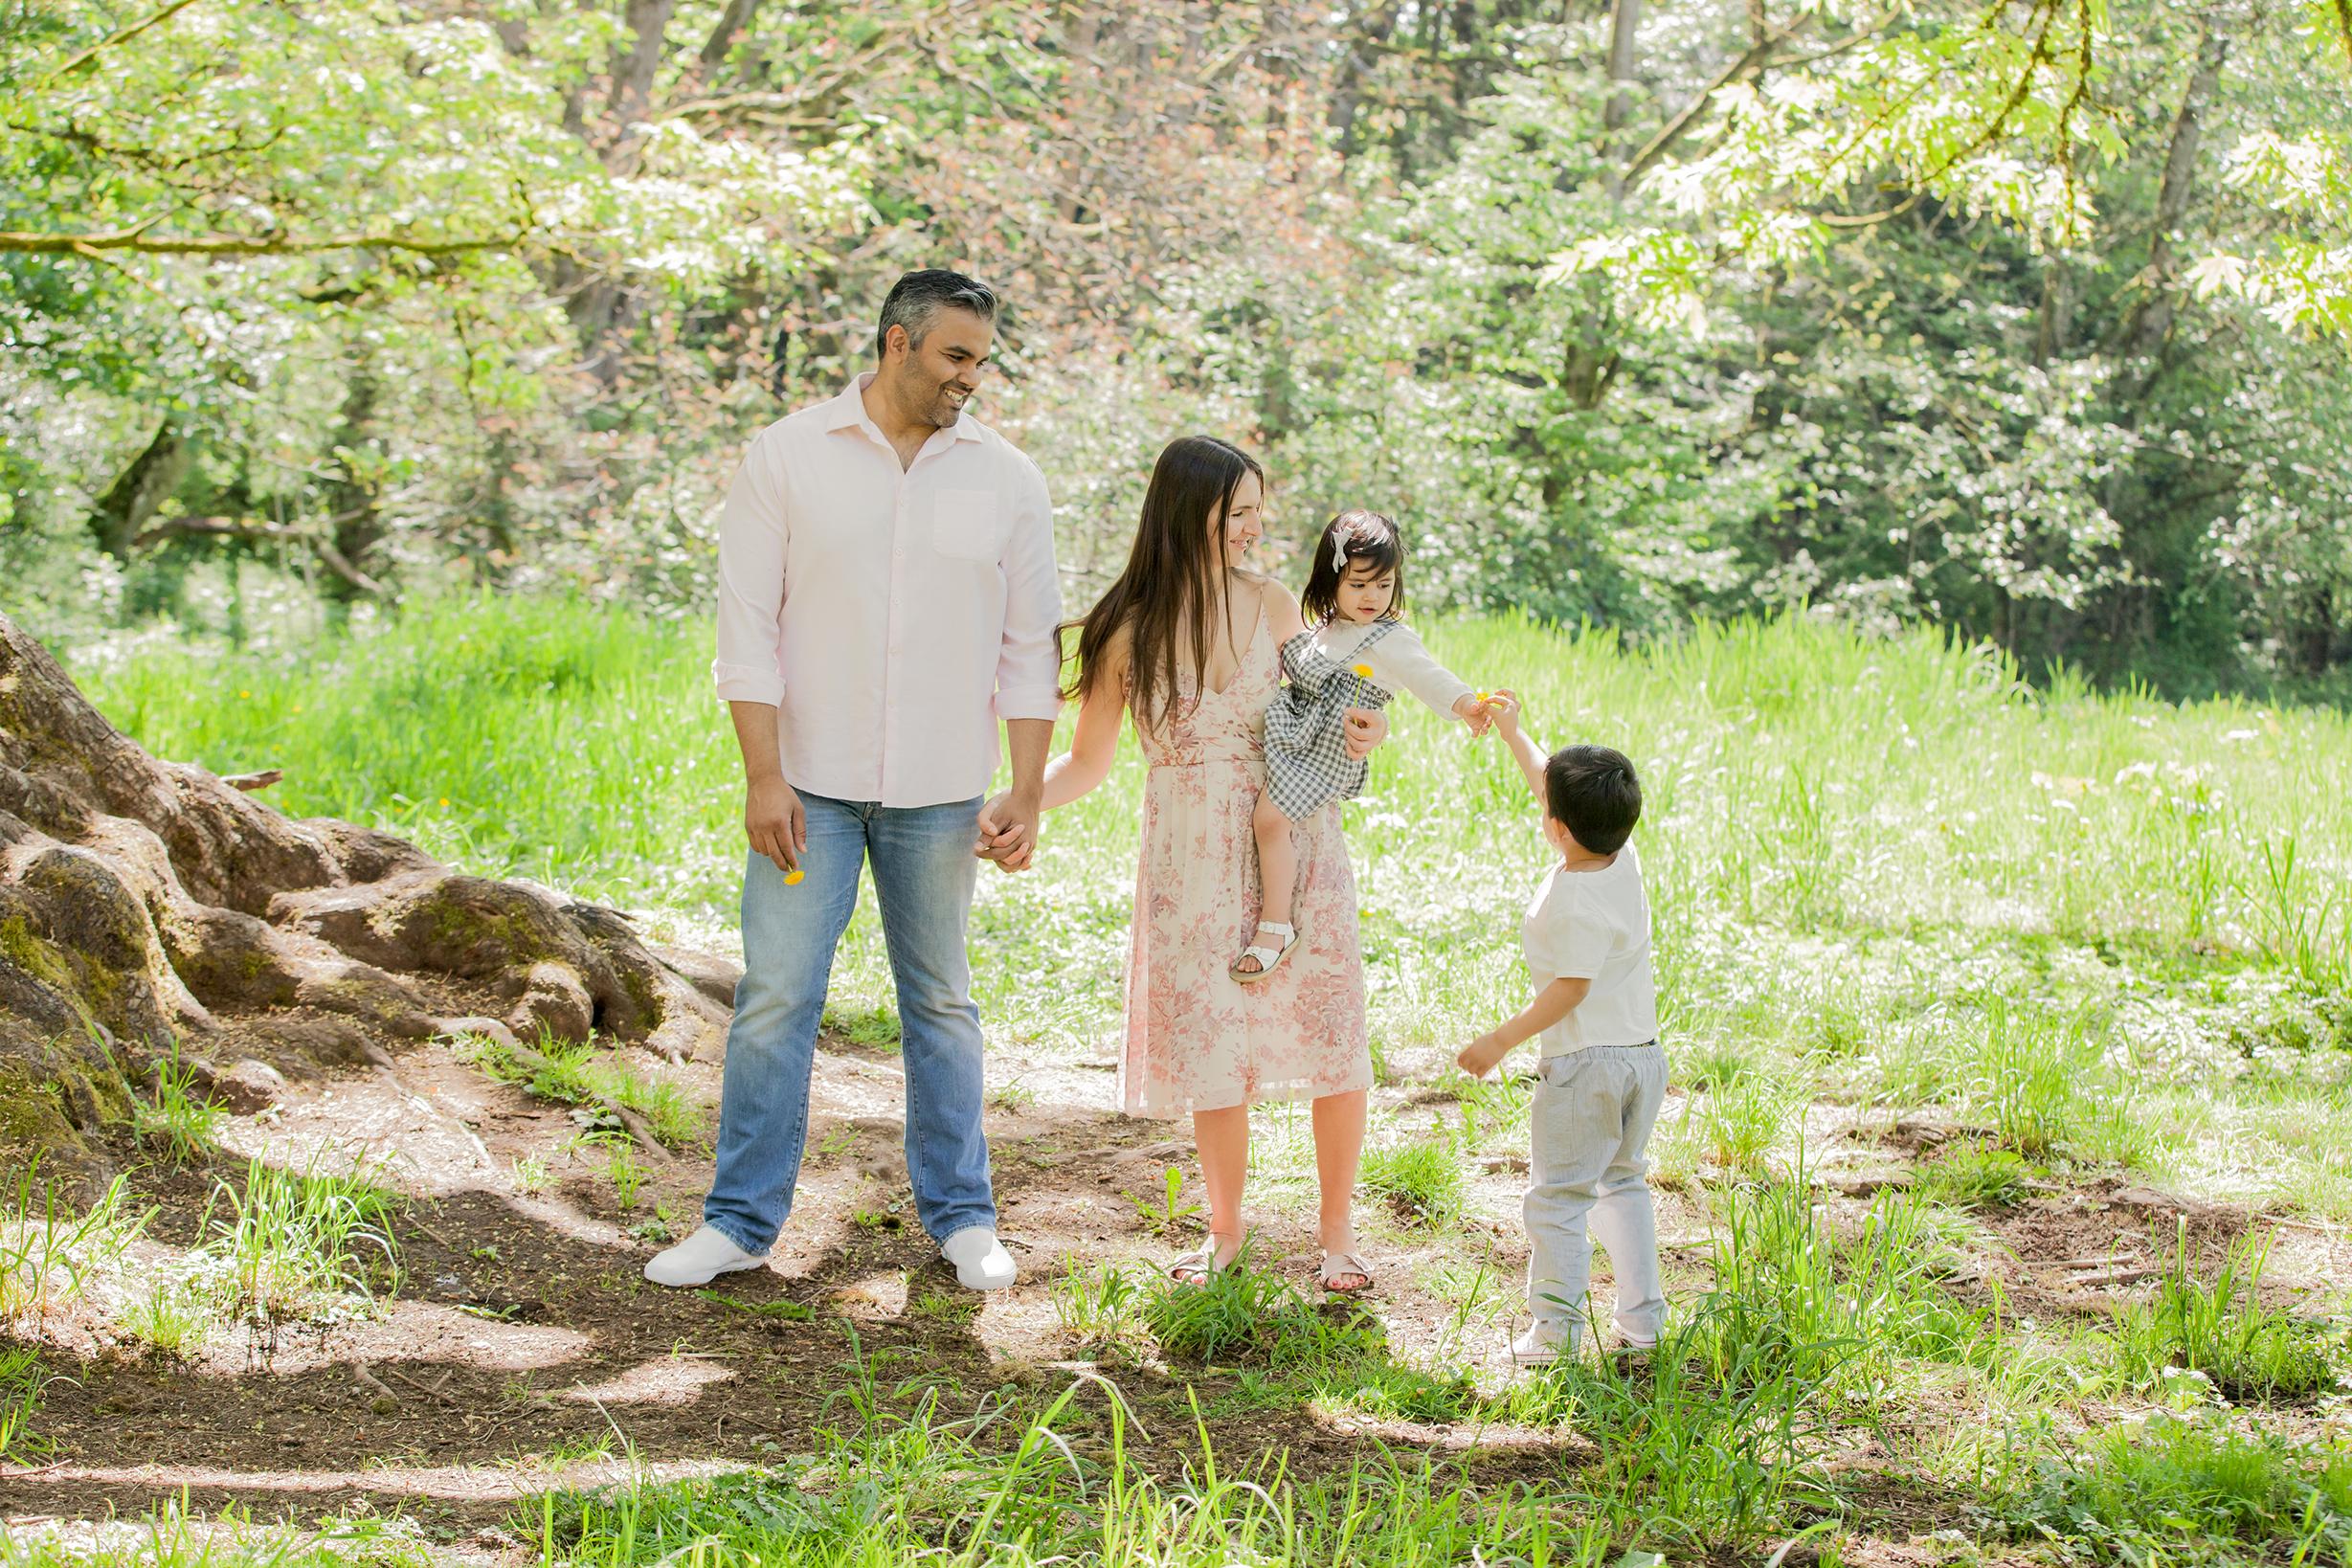 Redwood Park - May 2018 - WT (39 of 175).jpg